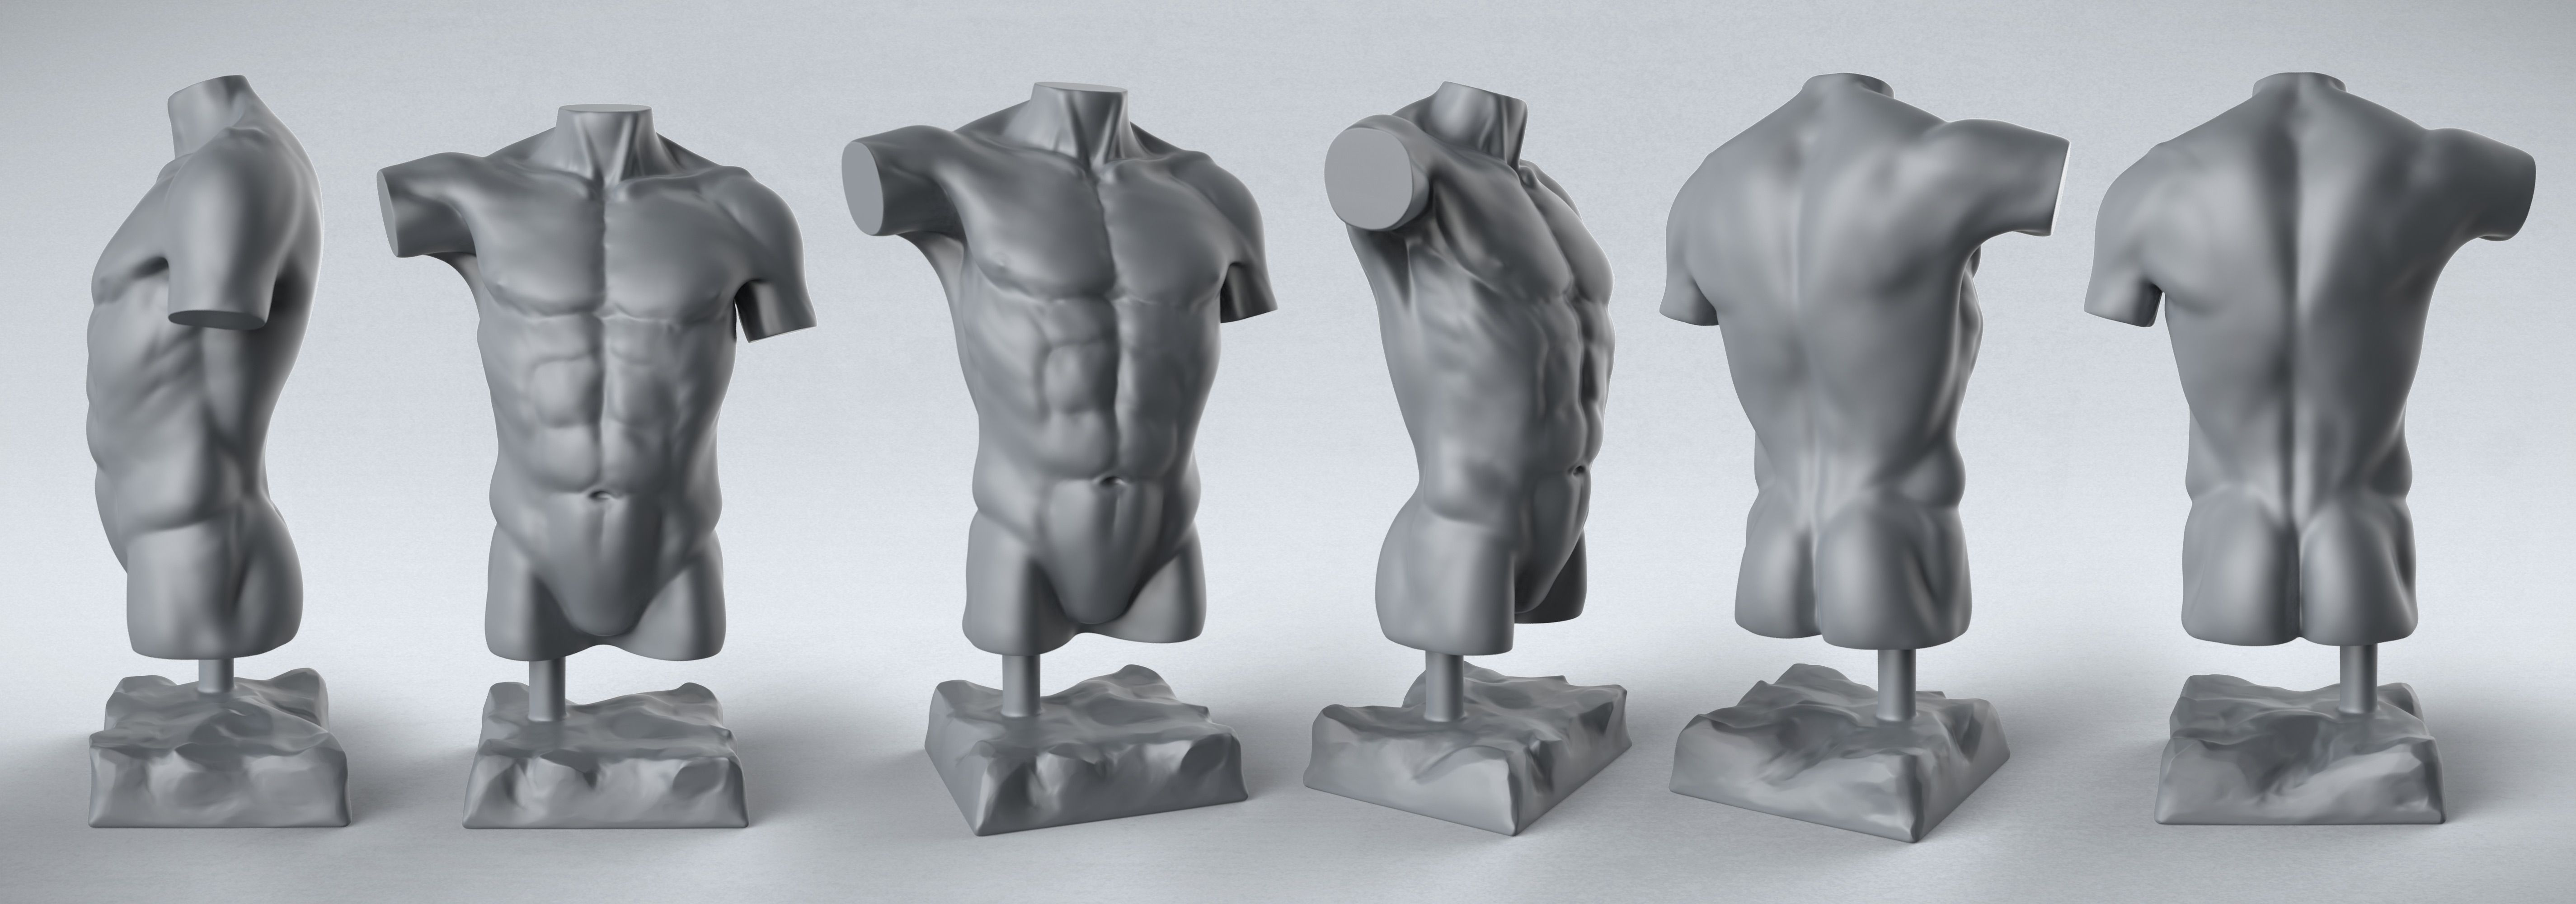 Male Torso Artistic Renderings Pinterest Male Torso Anatomy